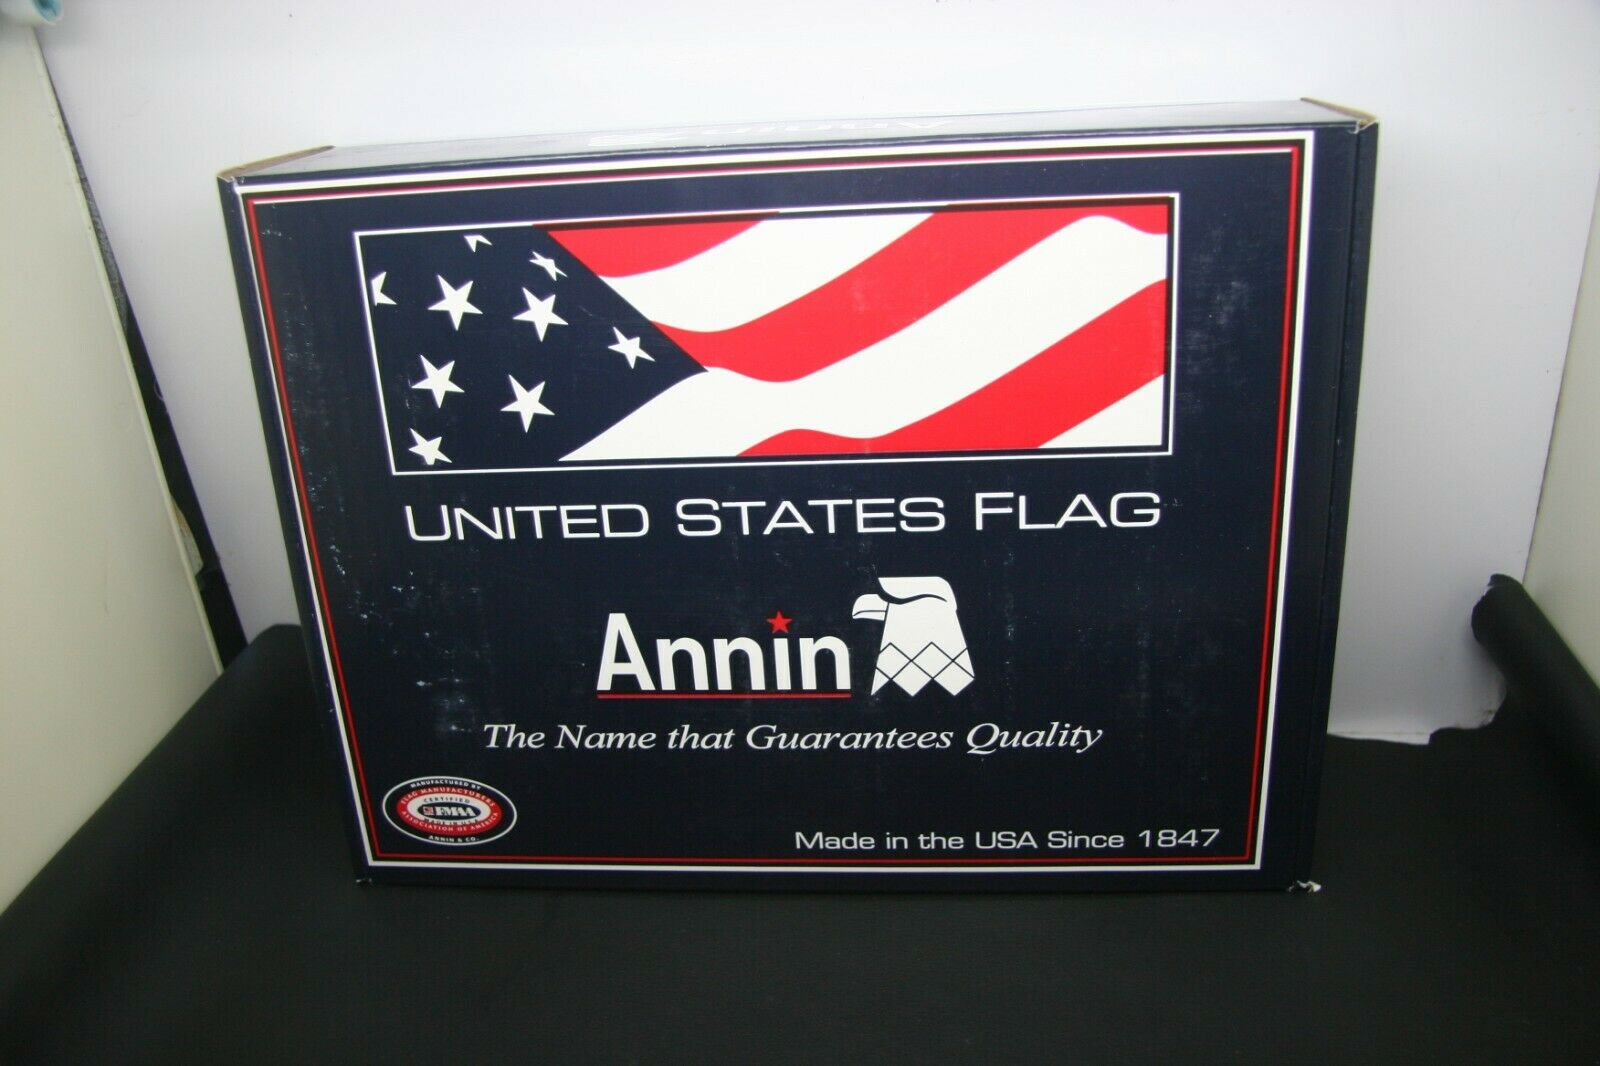 Annin UNITED STATE FLAG 5x8' ALL Weather NYL-GLO NYLON USA